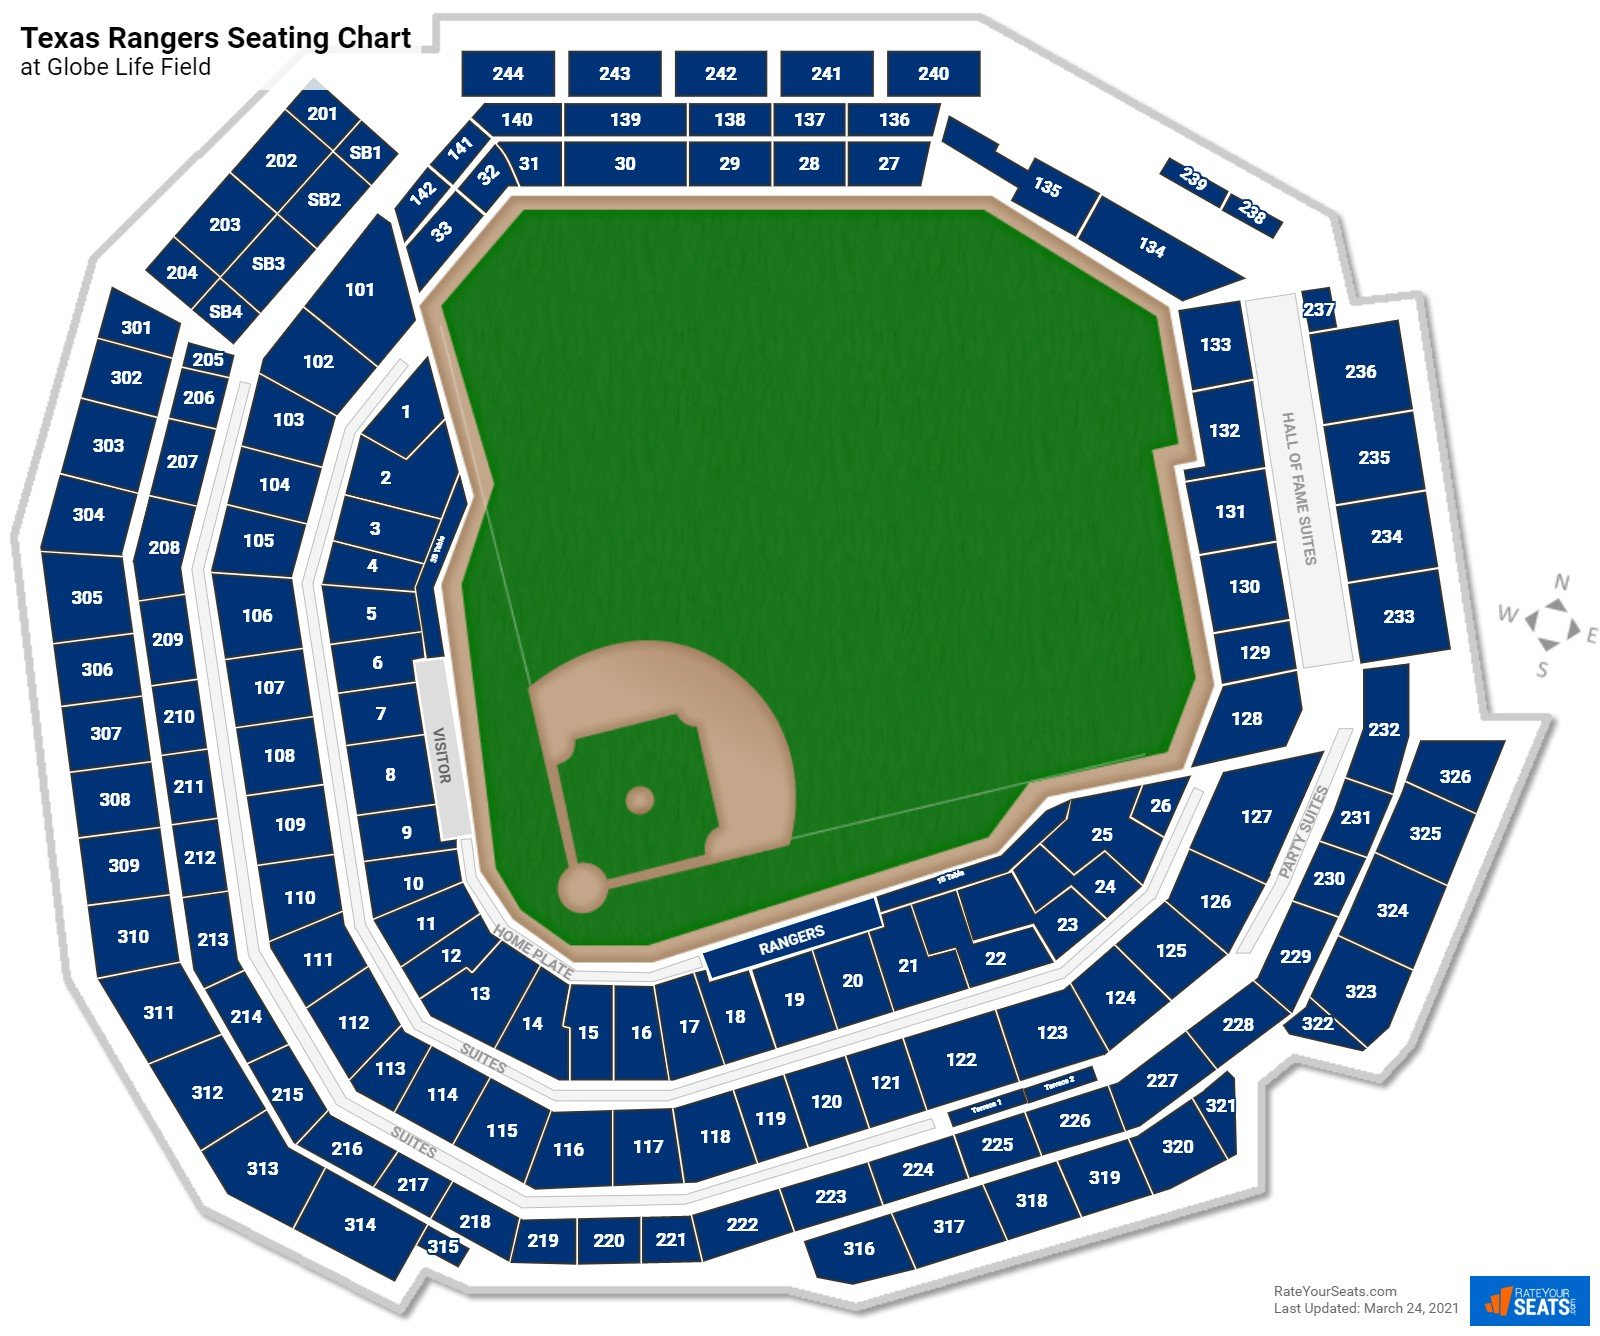 Texas Rangers Seating Charts At Globe Life Field Rateyourseats Com